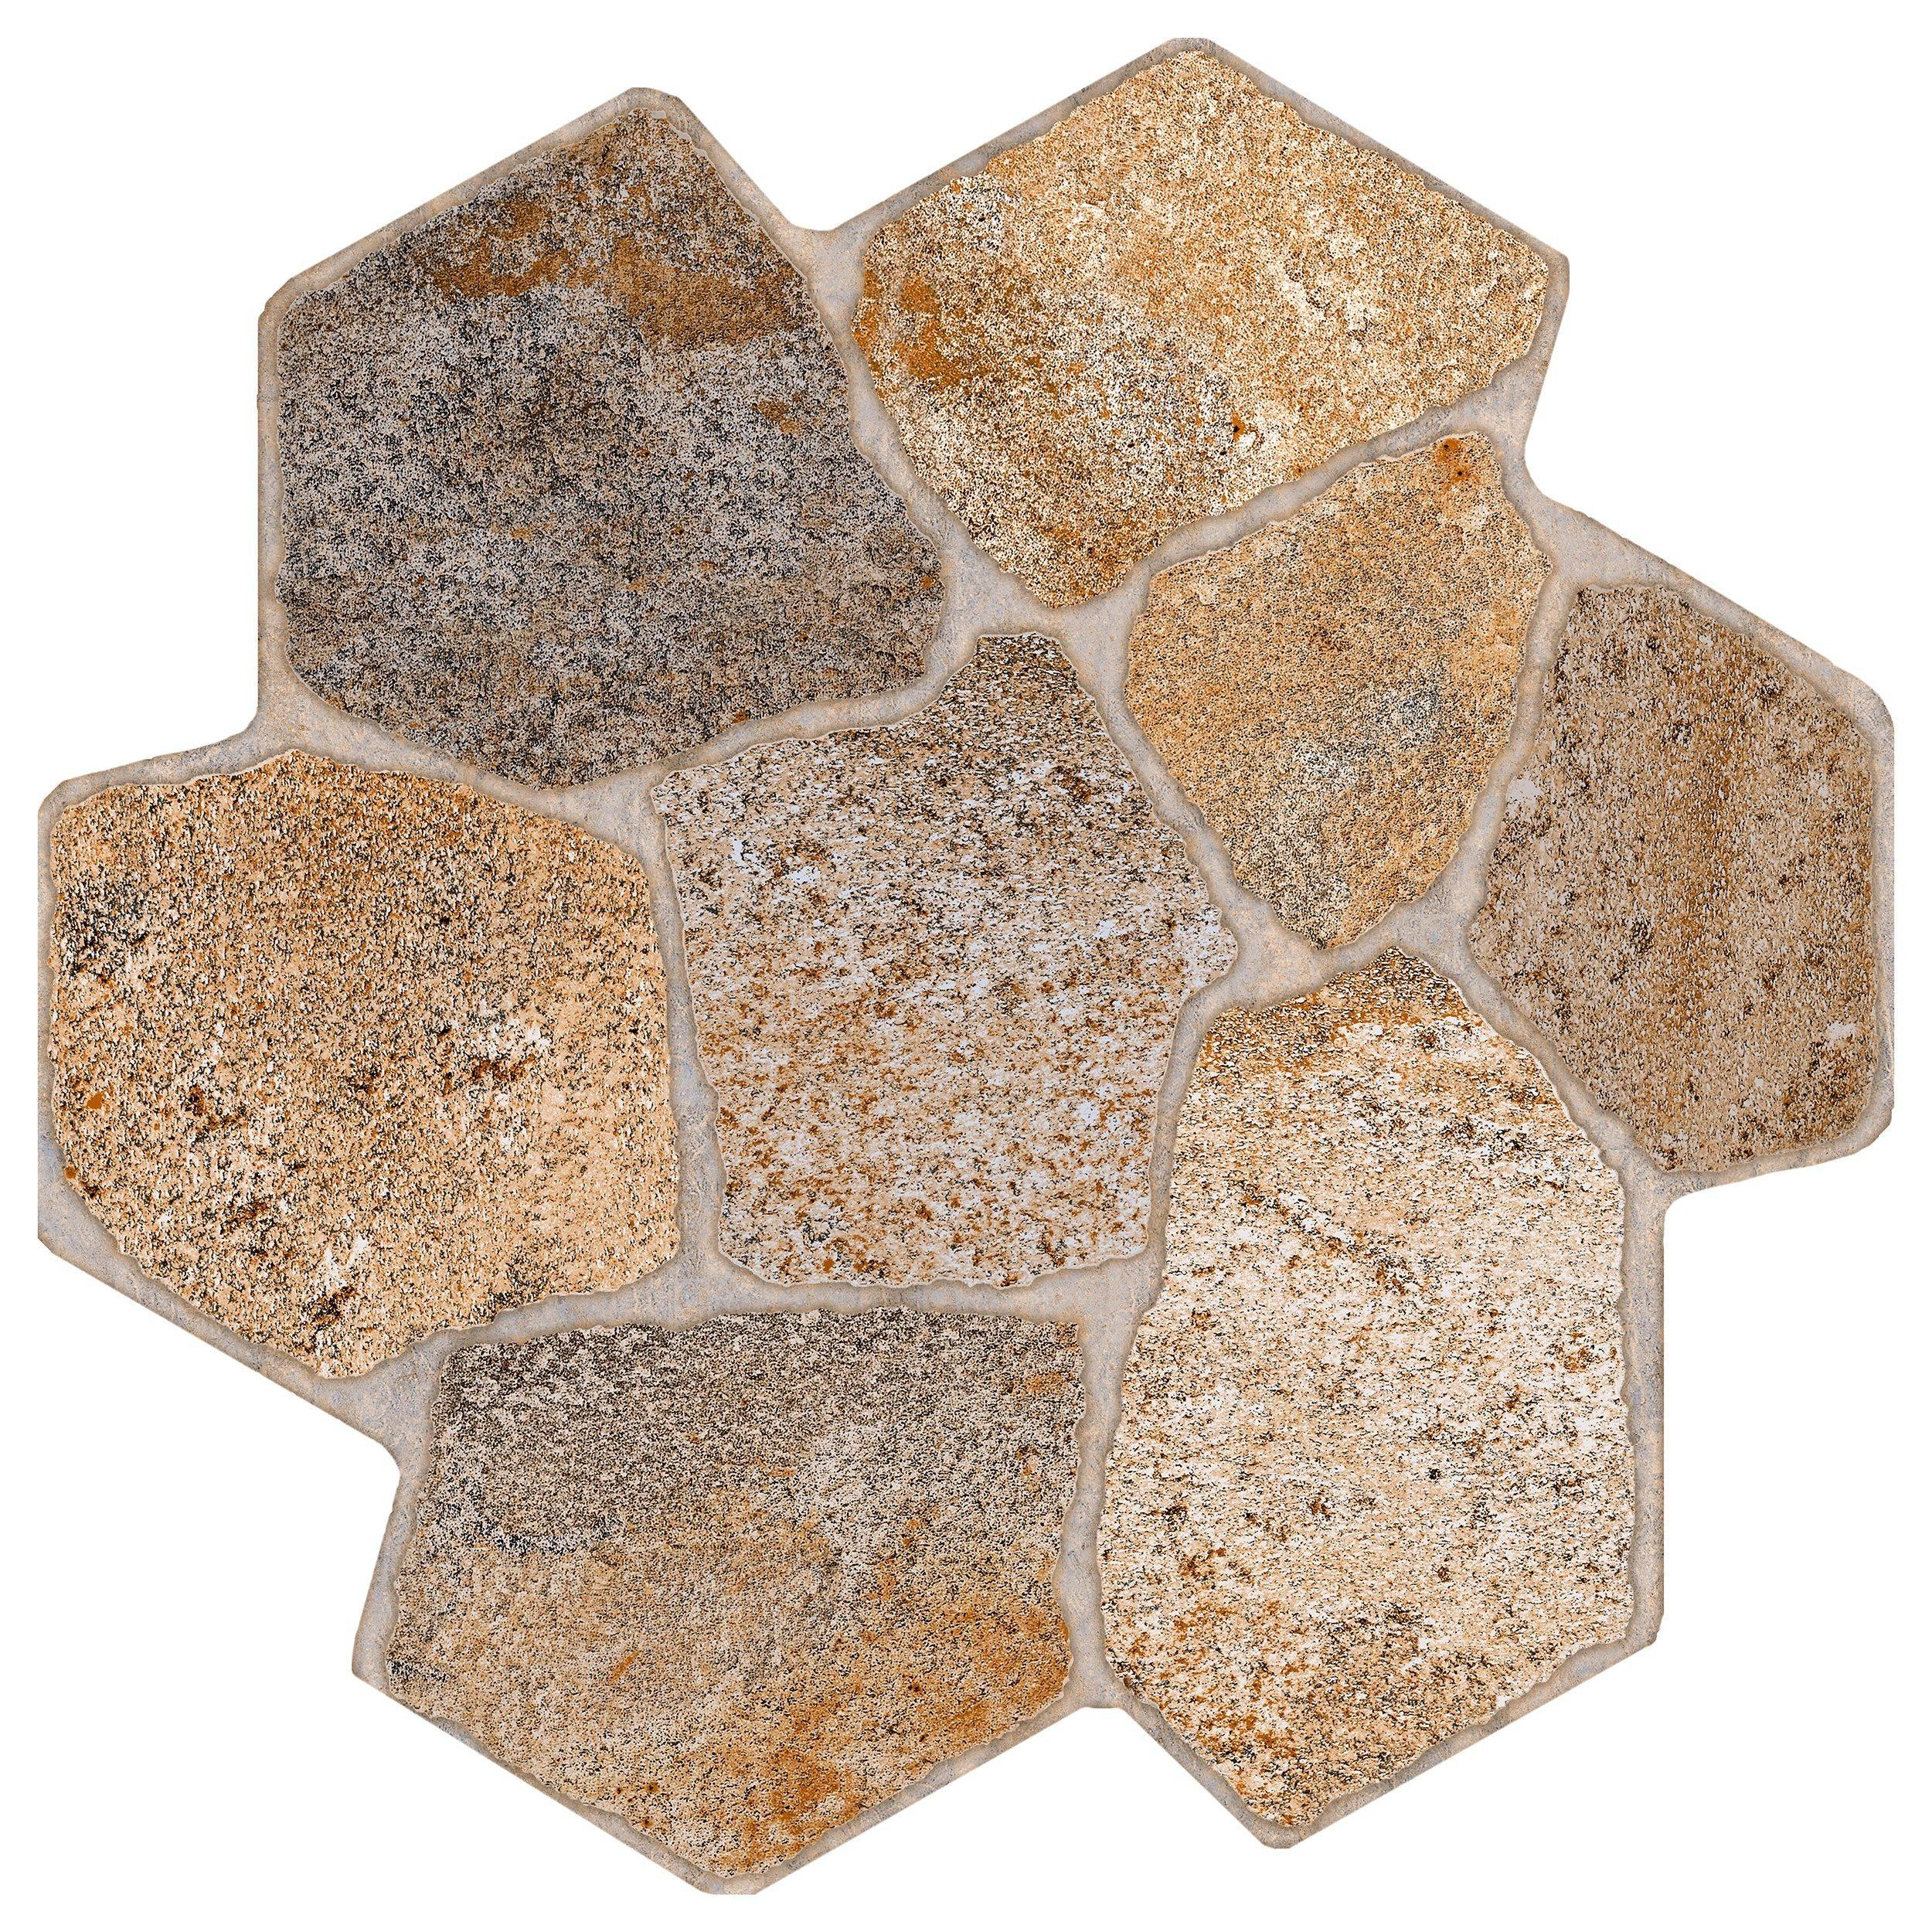 Via Appia Brown Porcelain Tile in 2019 Tiles, Bathroom